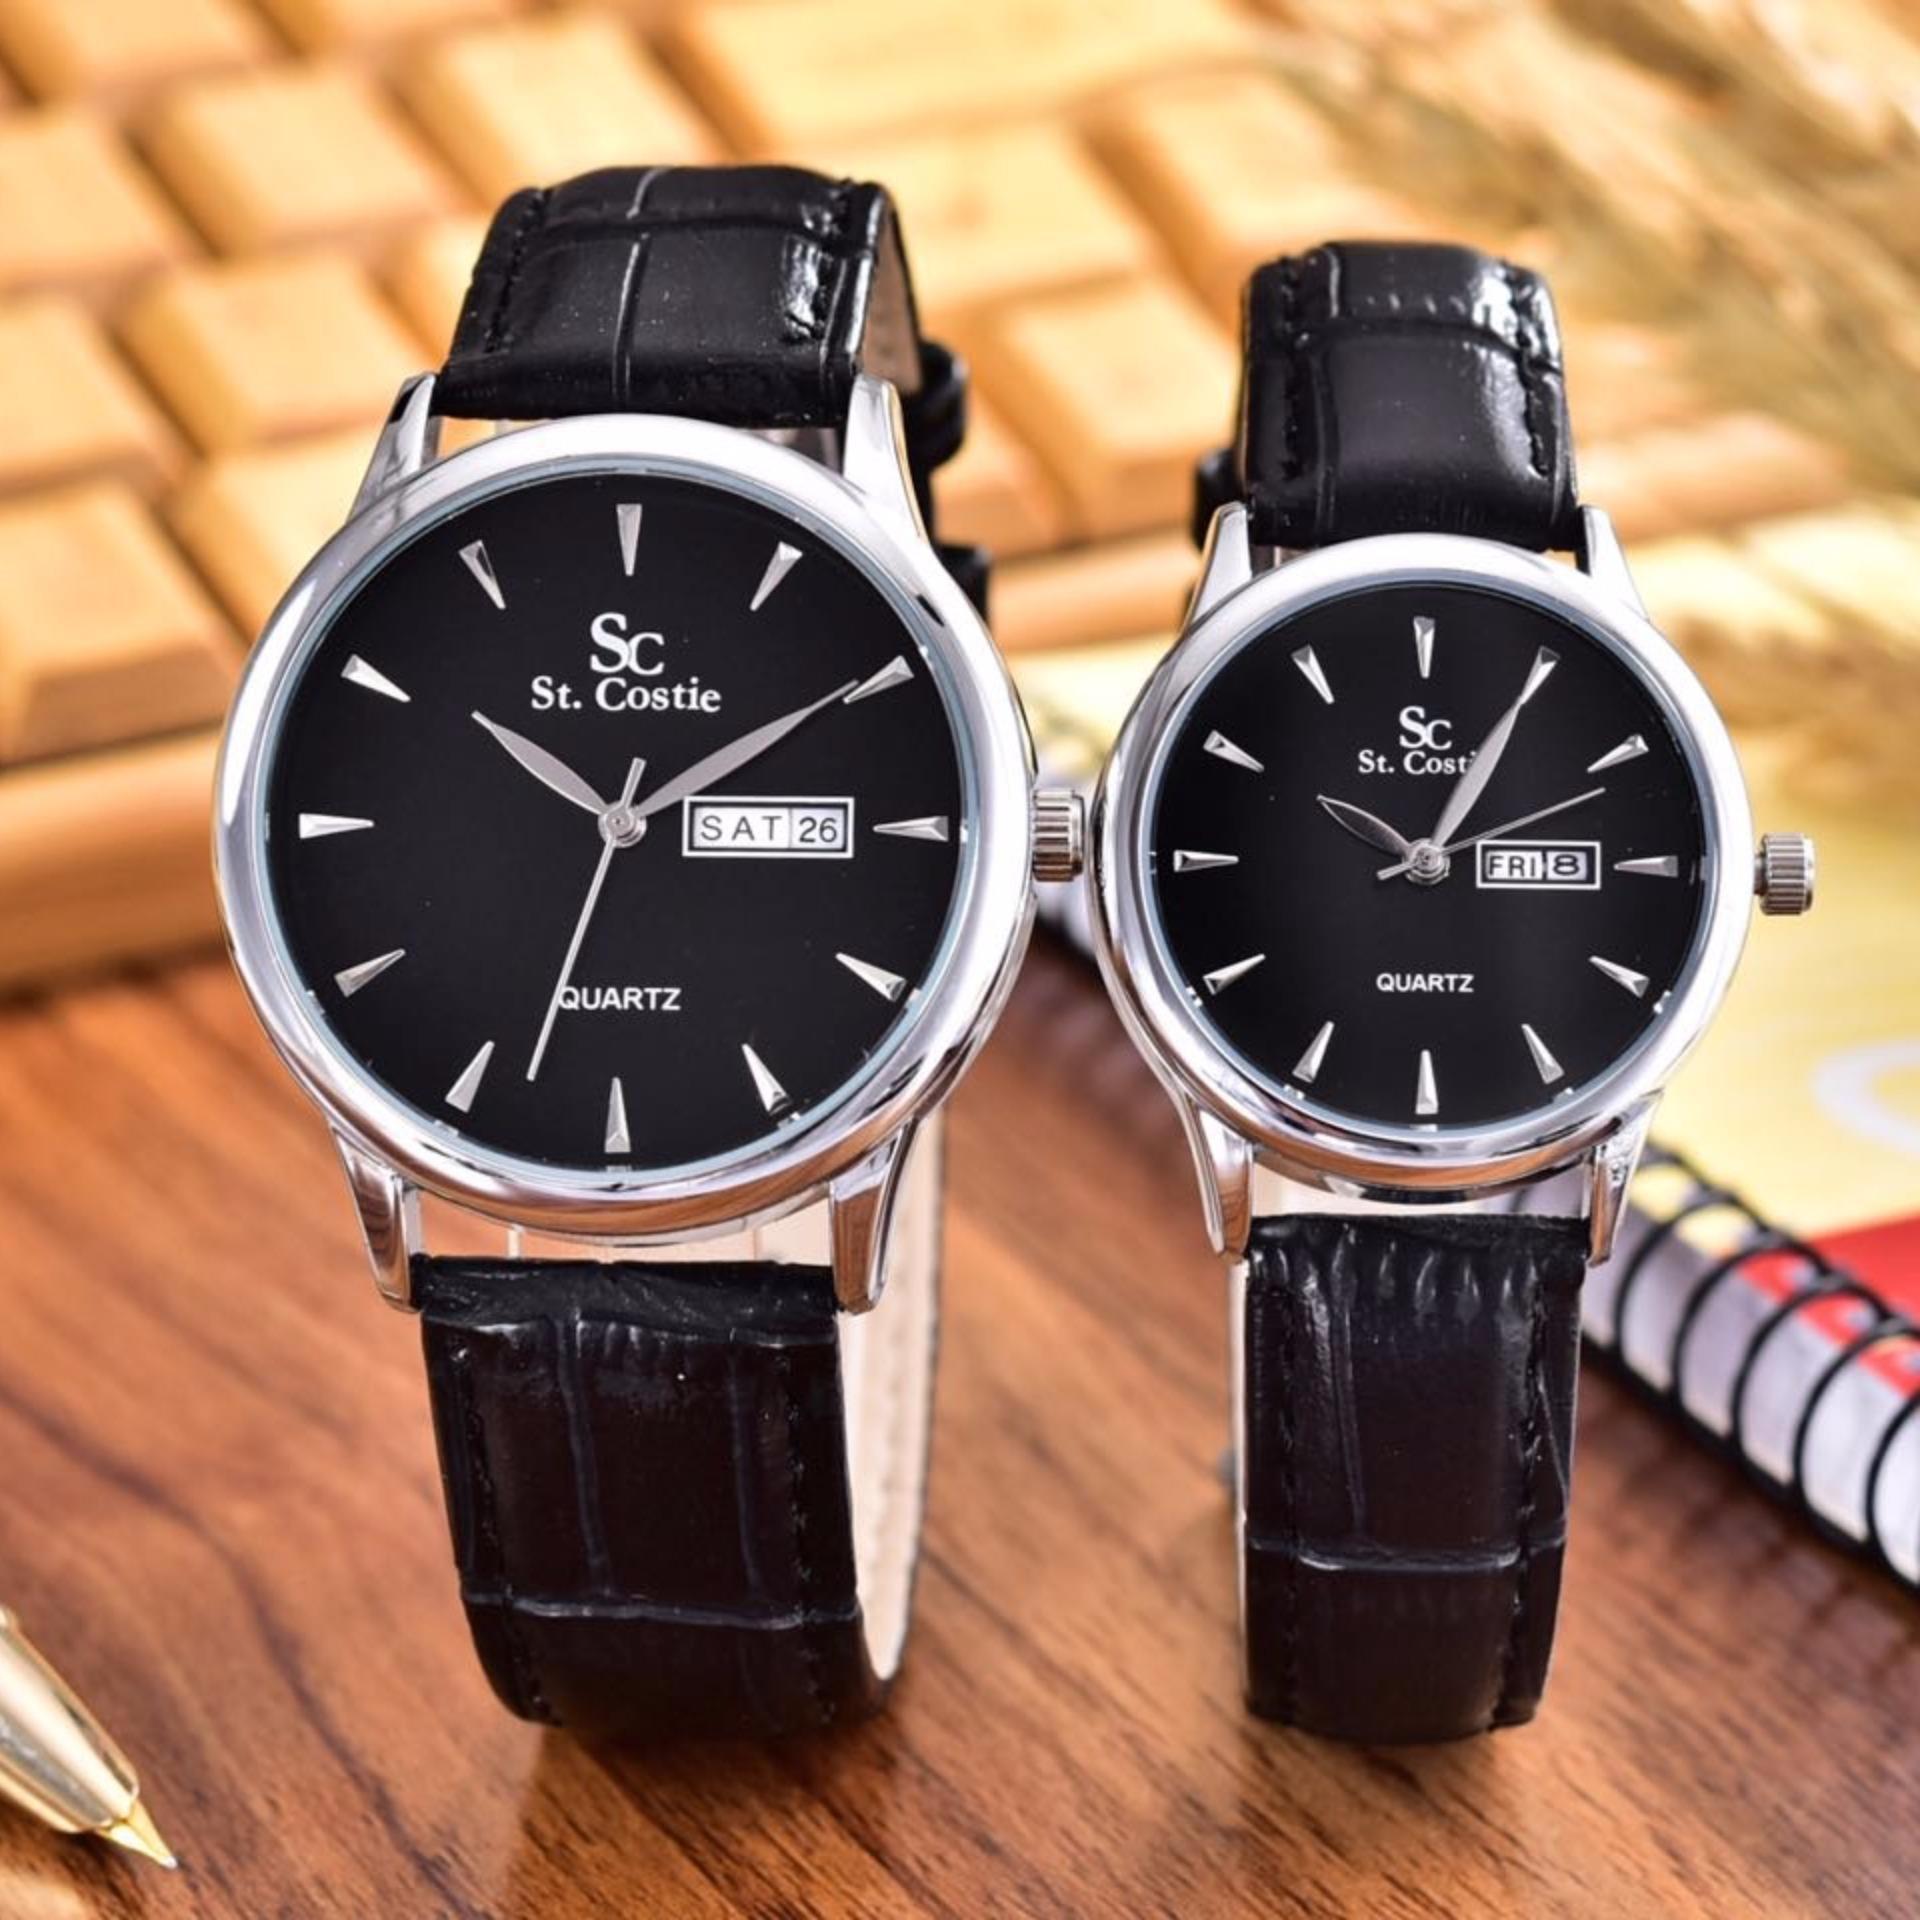 Saint Costie Original Brand - Jam Tangan Pria dan Wanita - Body Silver - Black Dial – Black Leather Strap  SC-JK-8009GL-T/H-SB-Couple-Black Leather